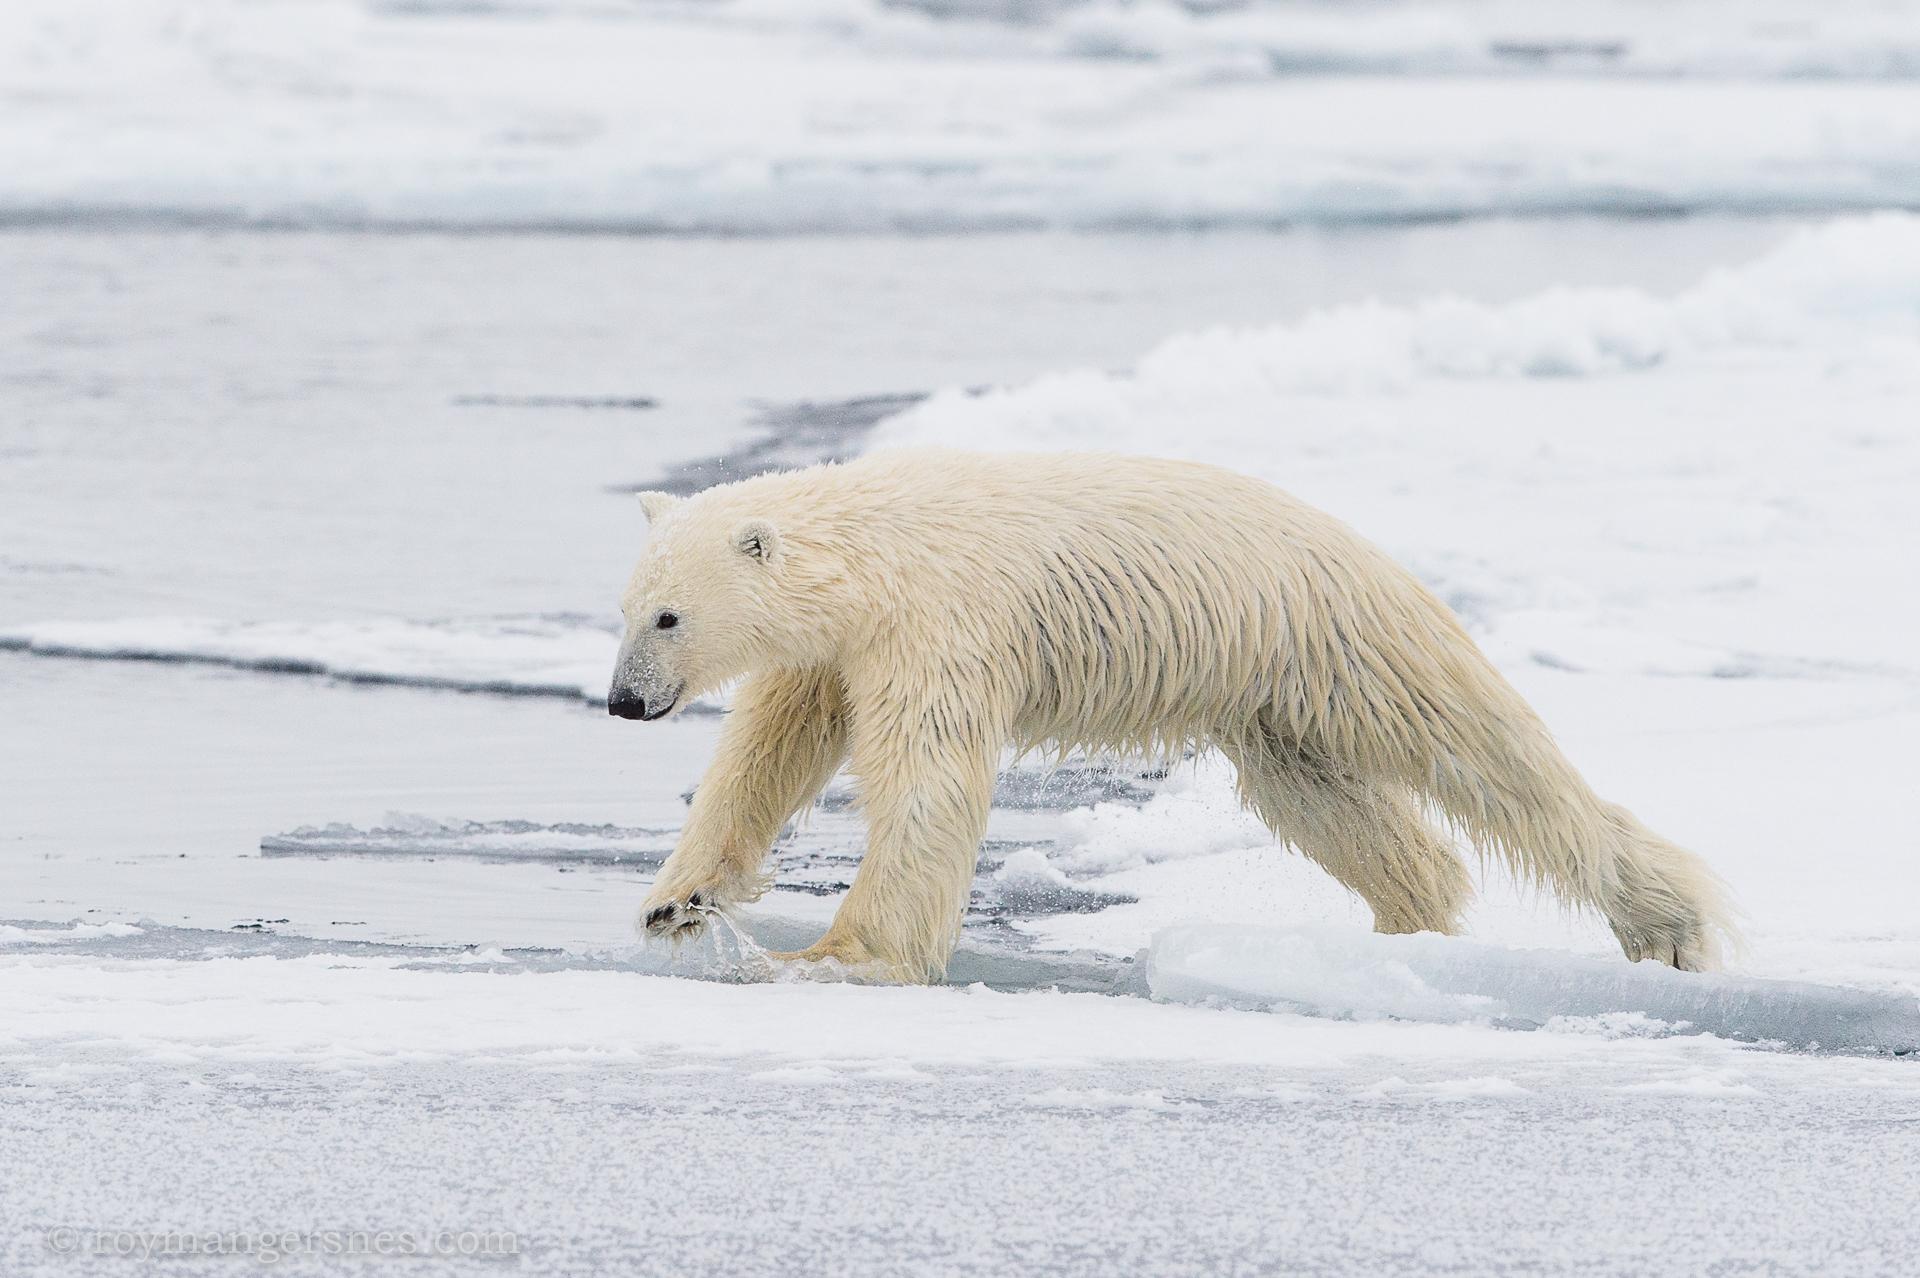 Polar bear Svalbard_winter3